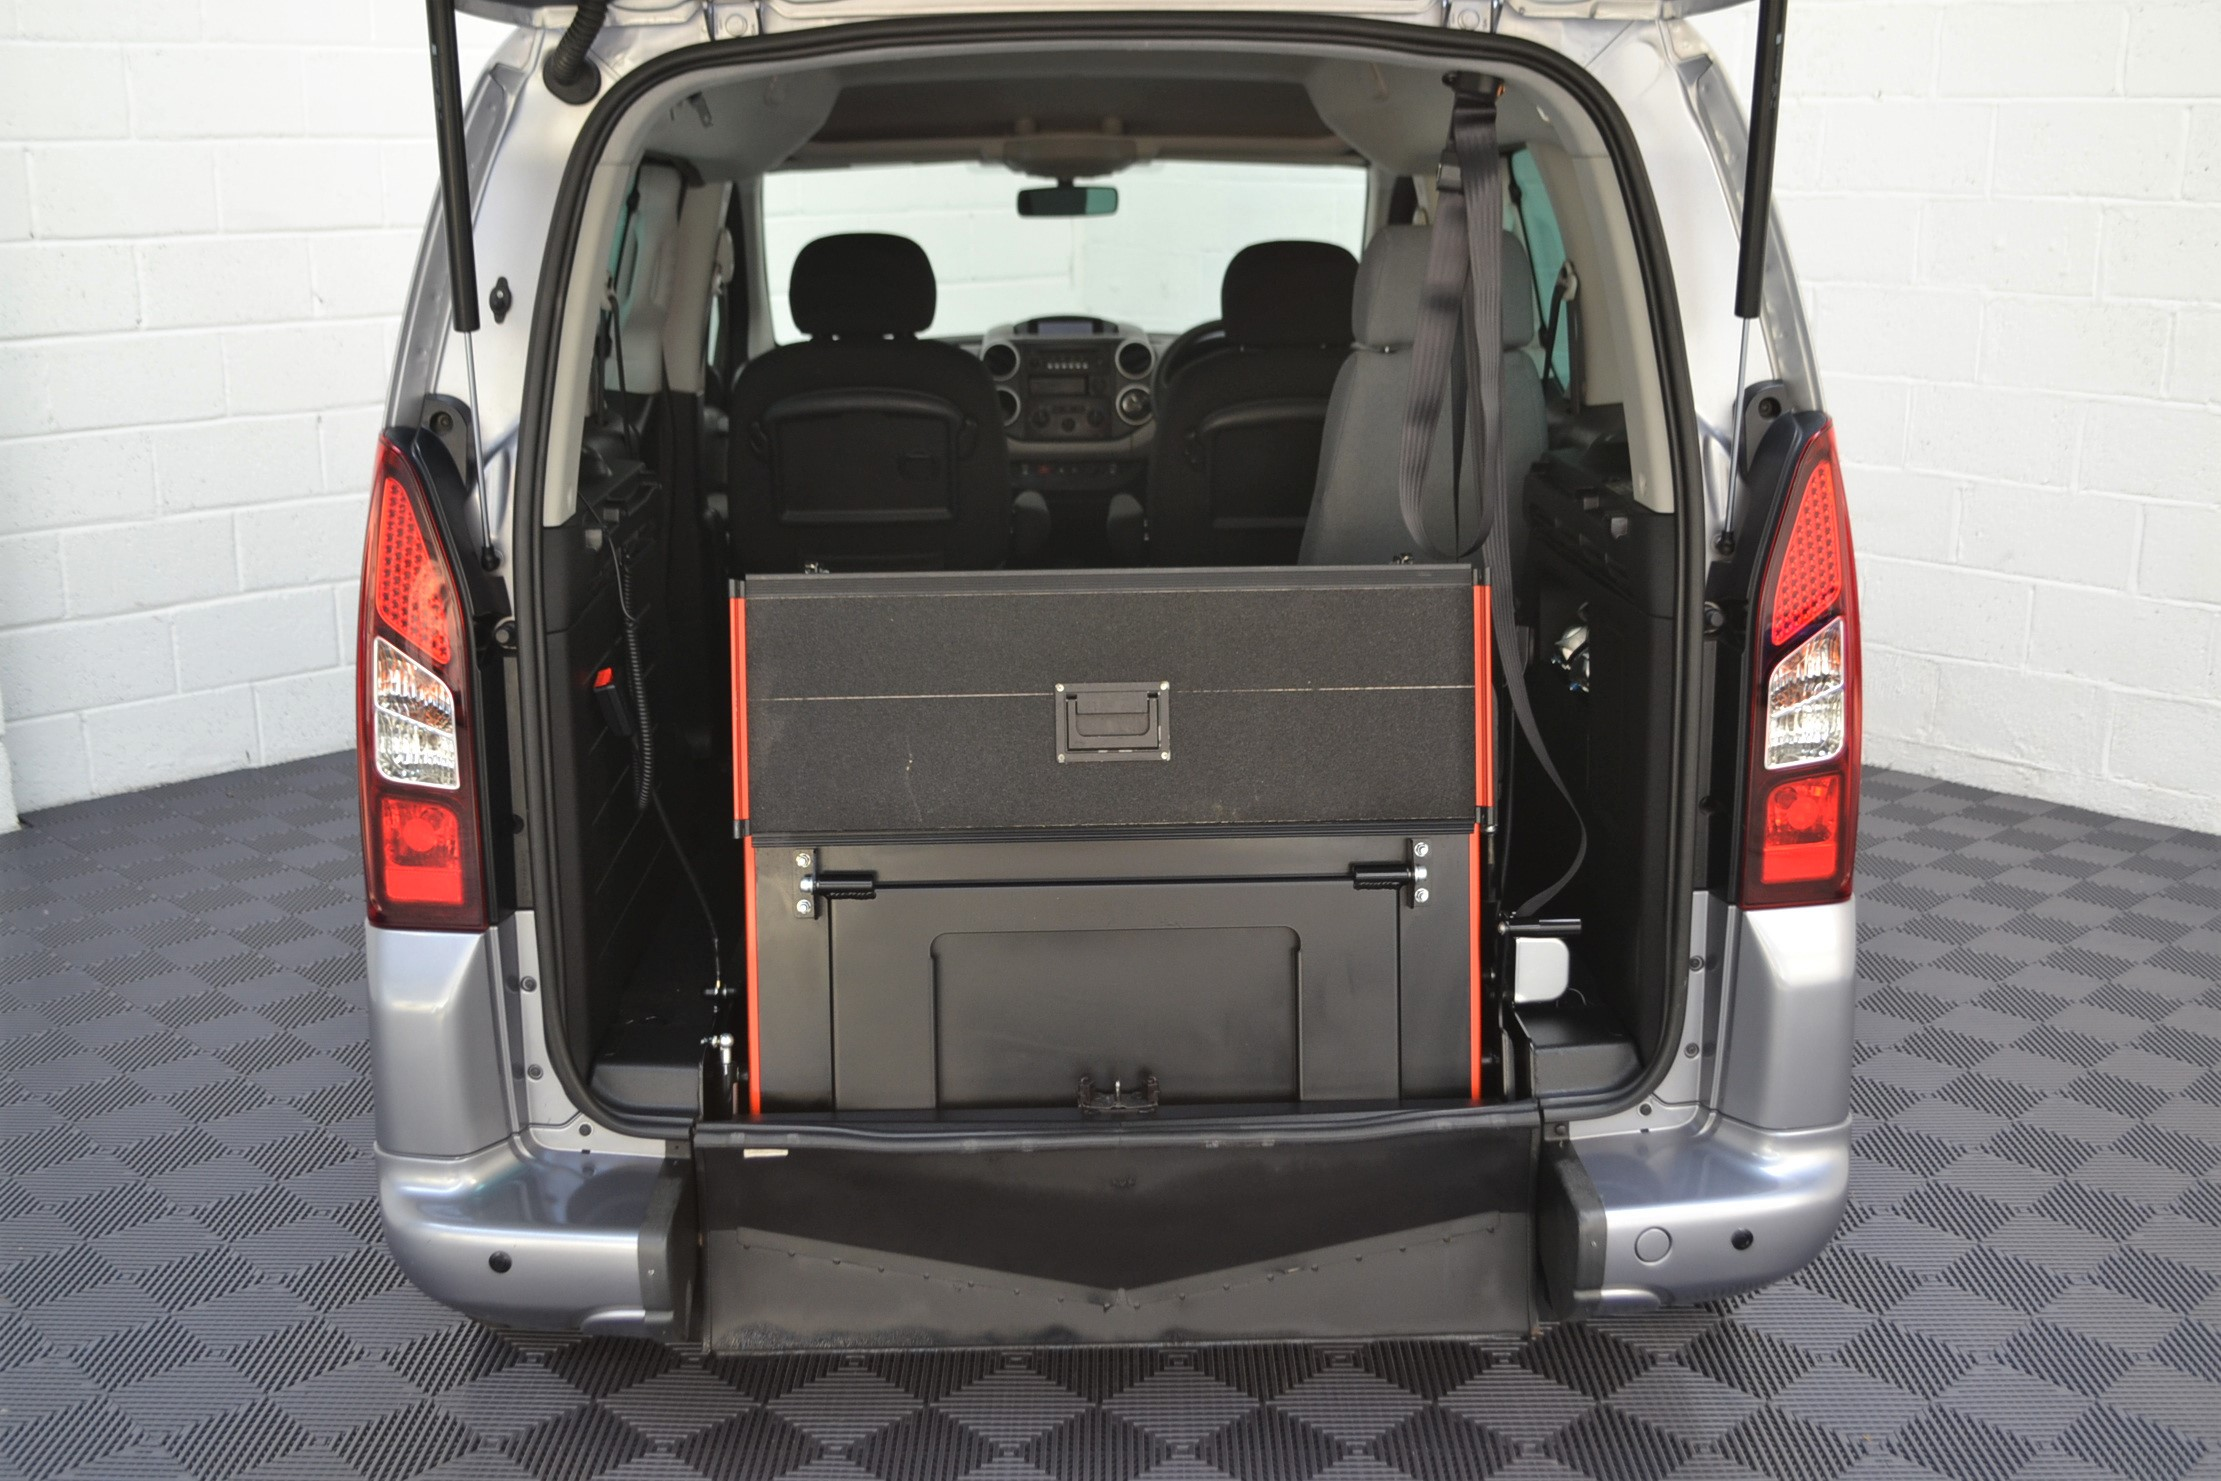 WAV Cars For Sale Bristol Wheelchair Accessible Vehicles Used For Sale Somerset Devon Dorset Bath Peugeot Partner Auto 6